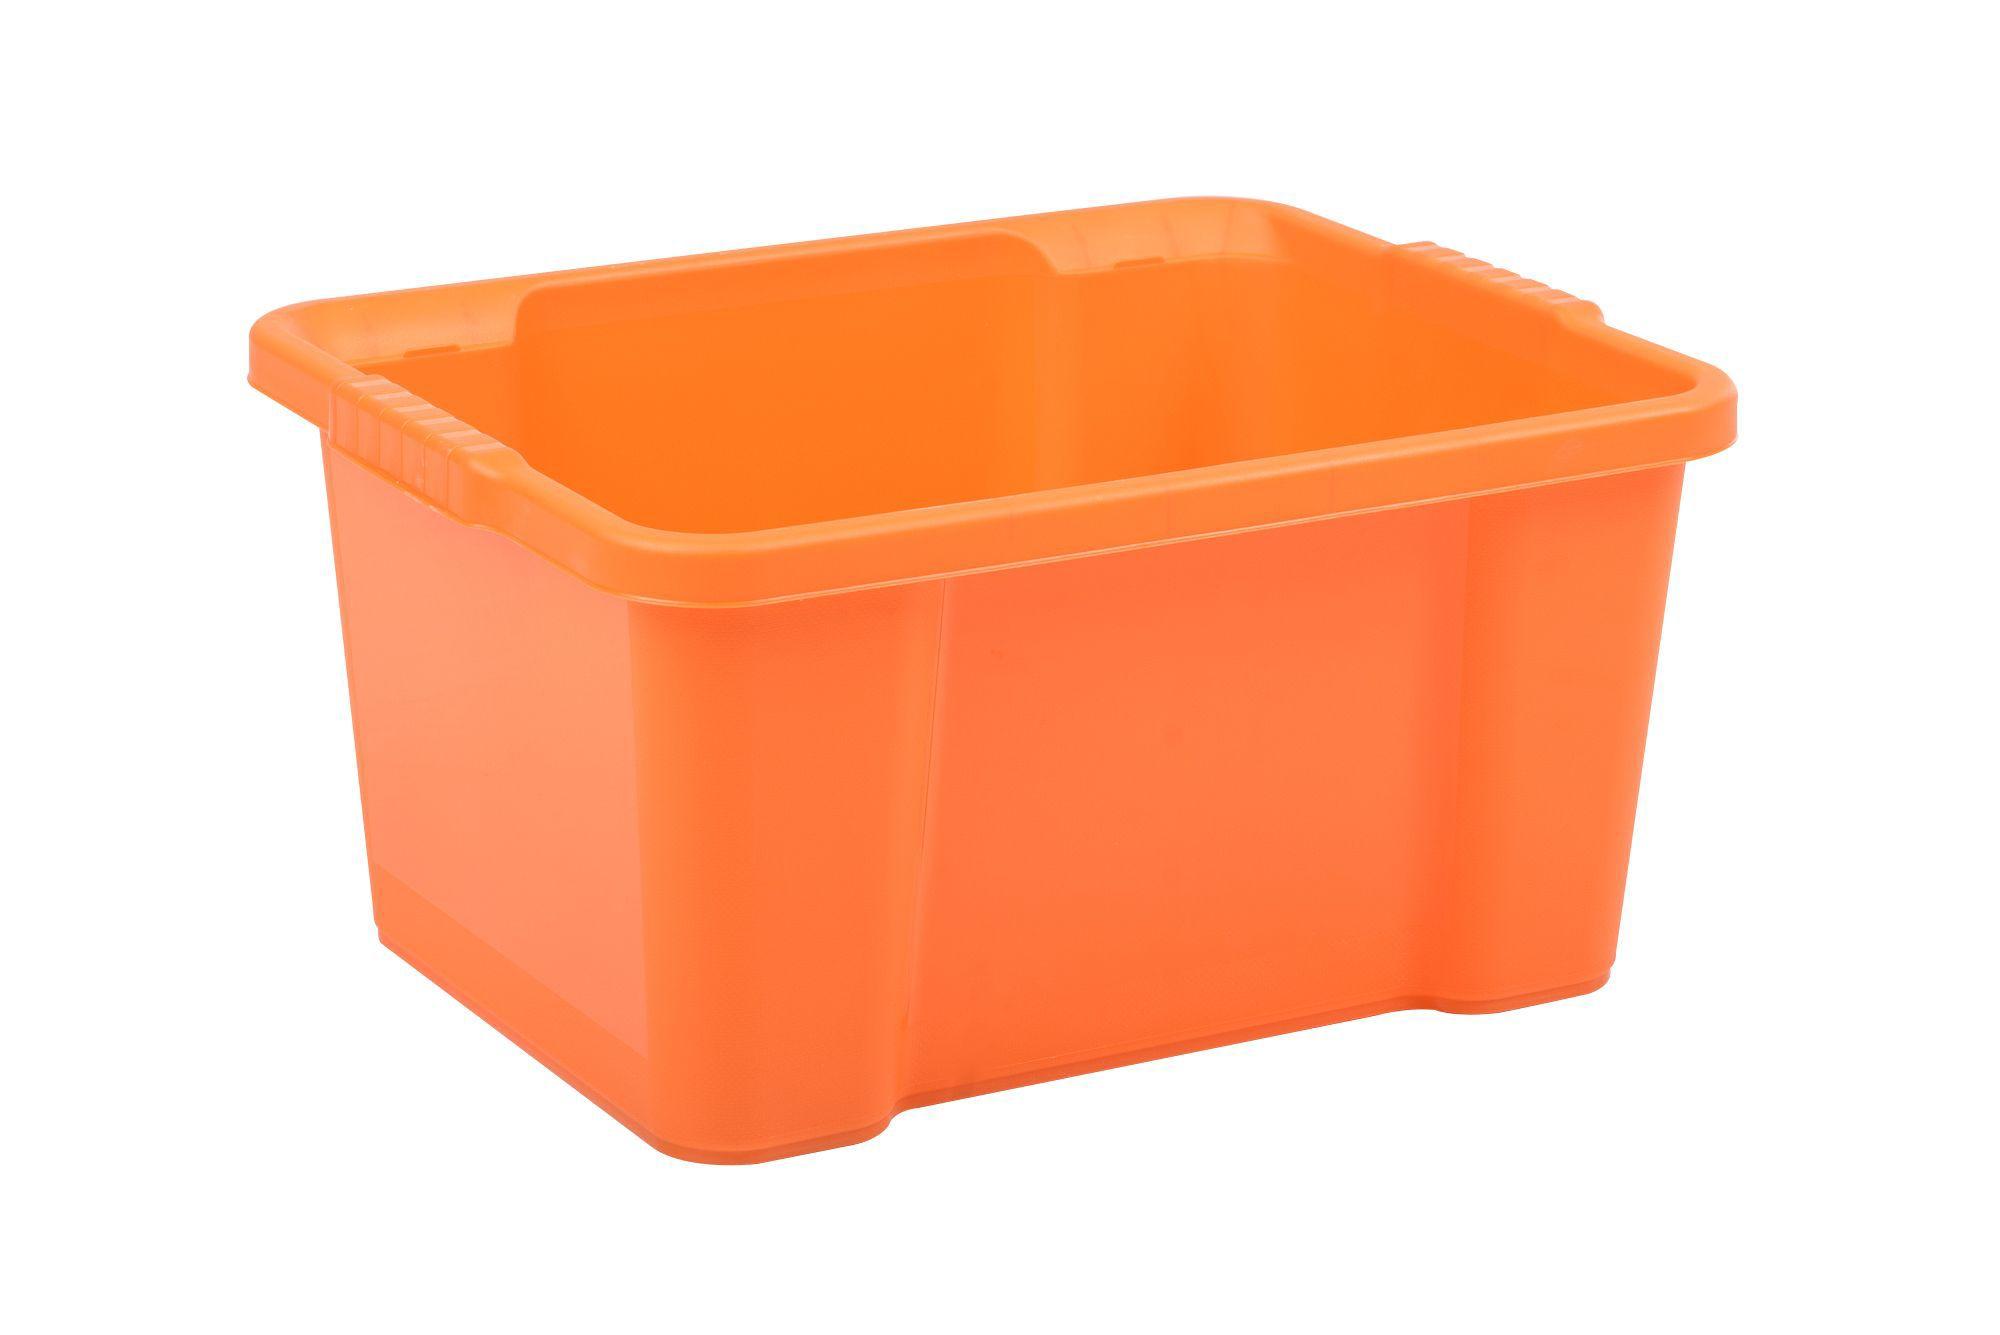 storage boxes durable orange 30l plastic storage box departments diy at b q. Black Bedroom Furniture Sets. Home Design Ideas